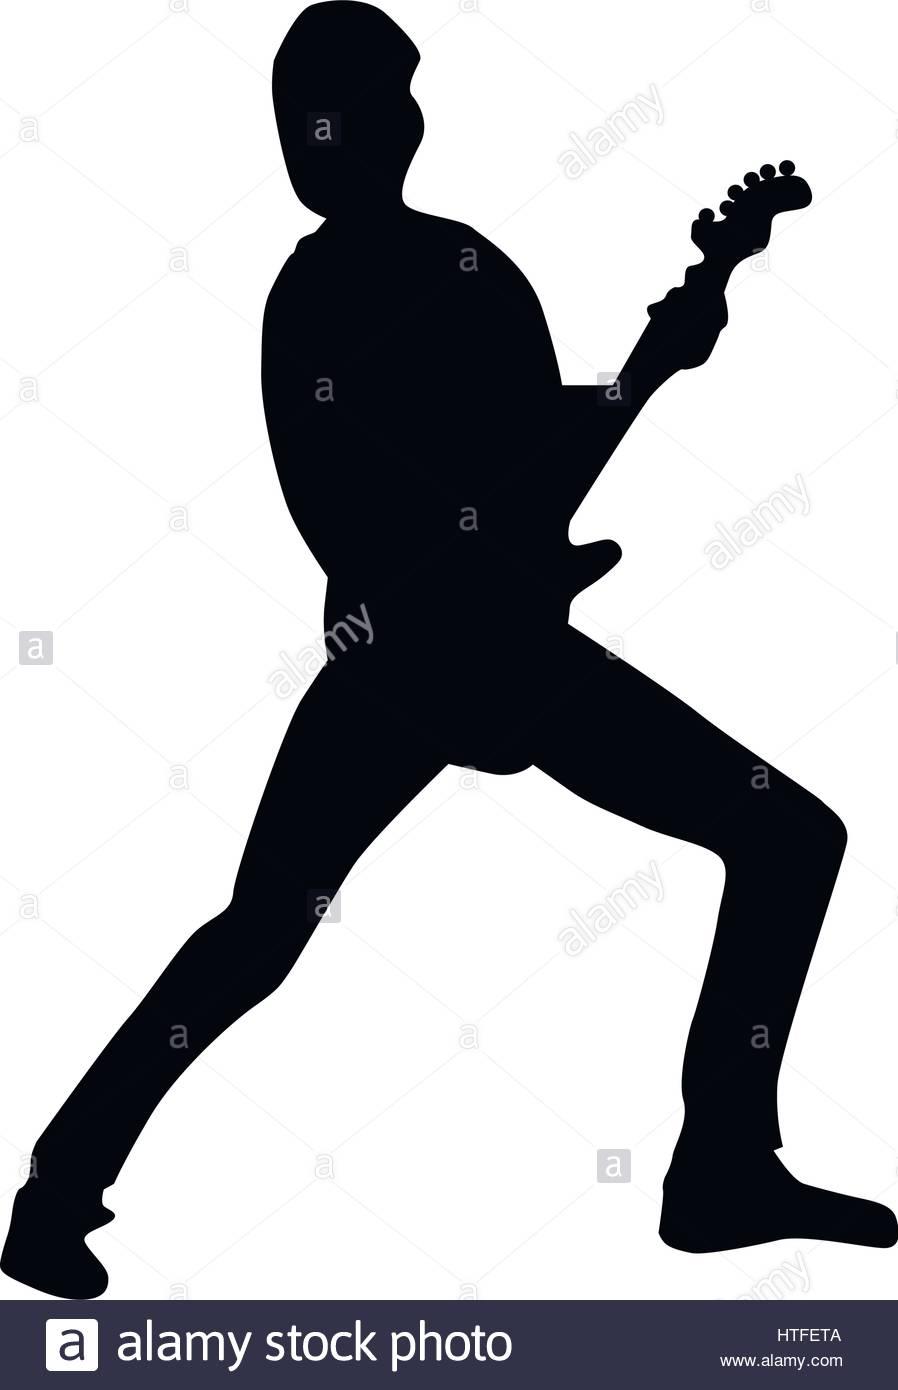 898x1390 Guitarist Silhouette Black Stock Vector Art Amp Illustration, Vector